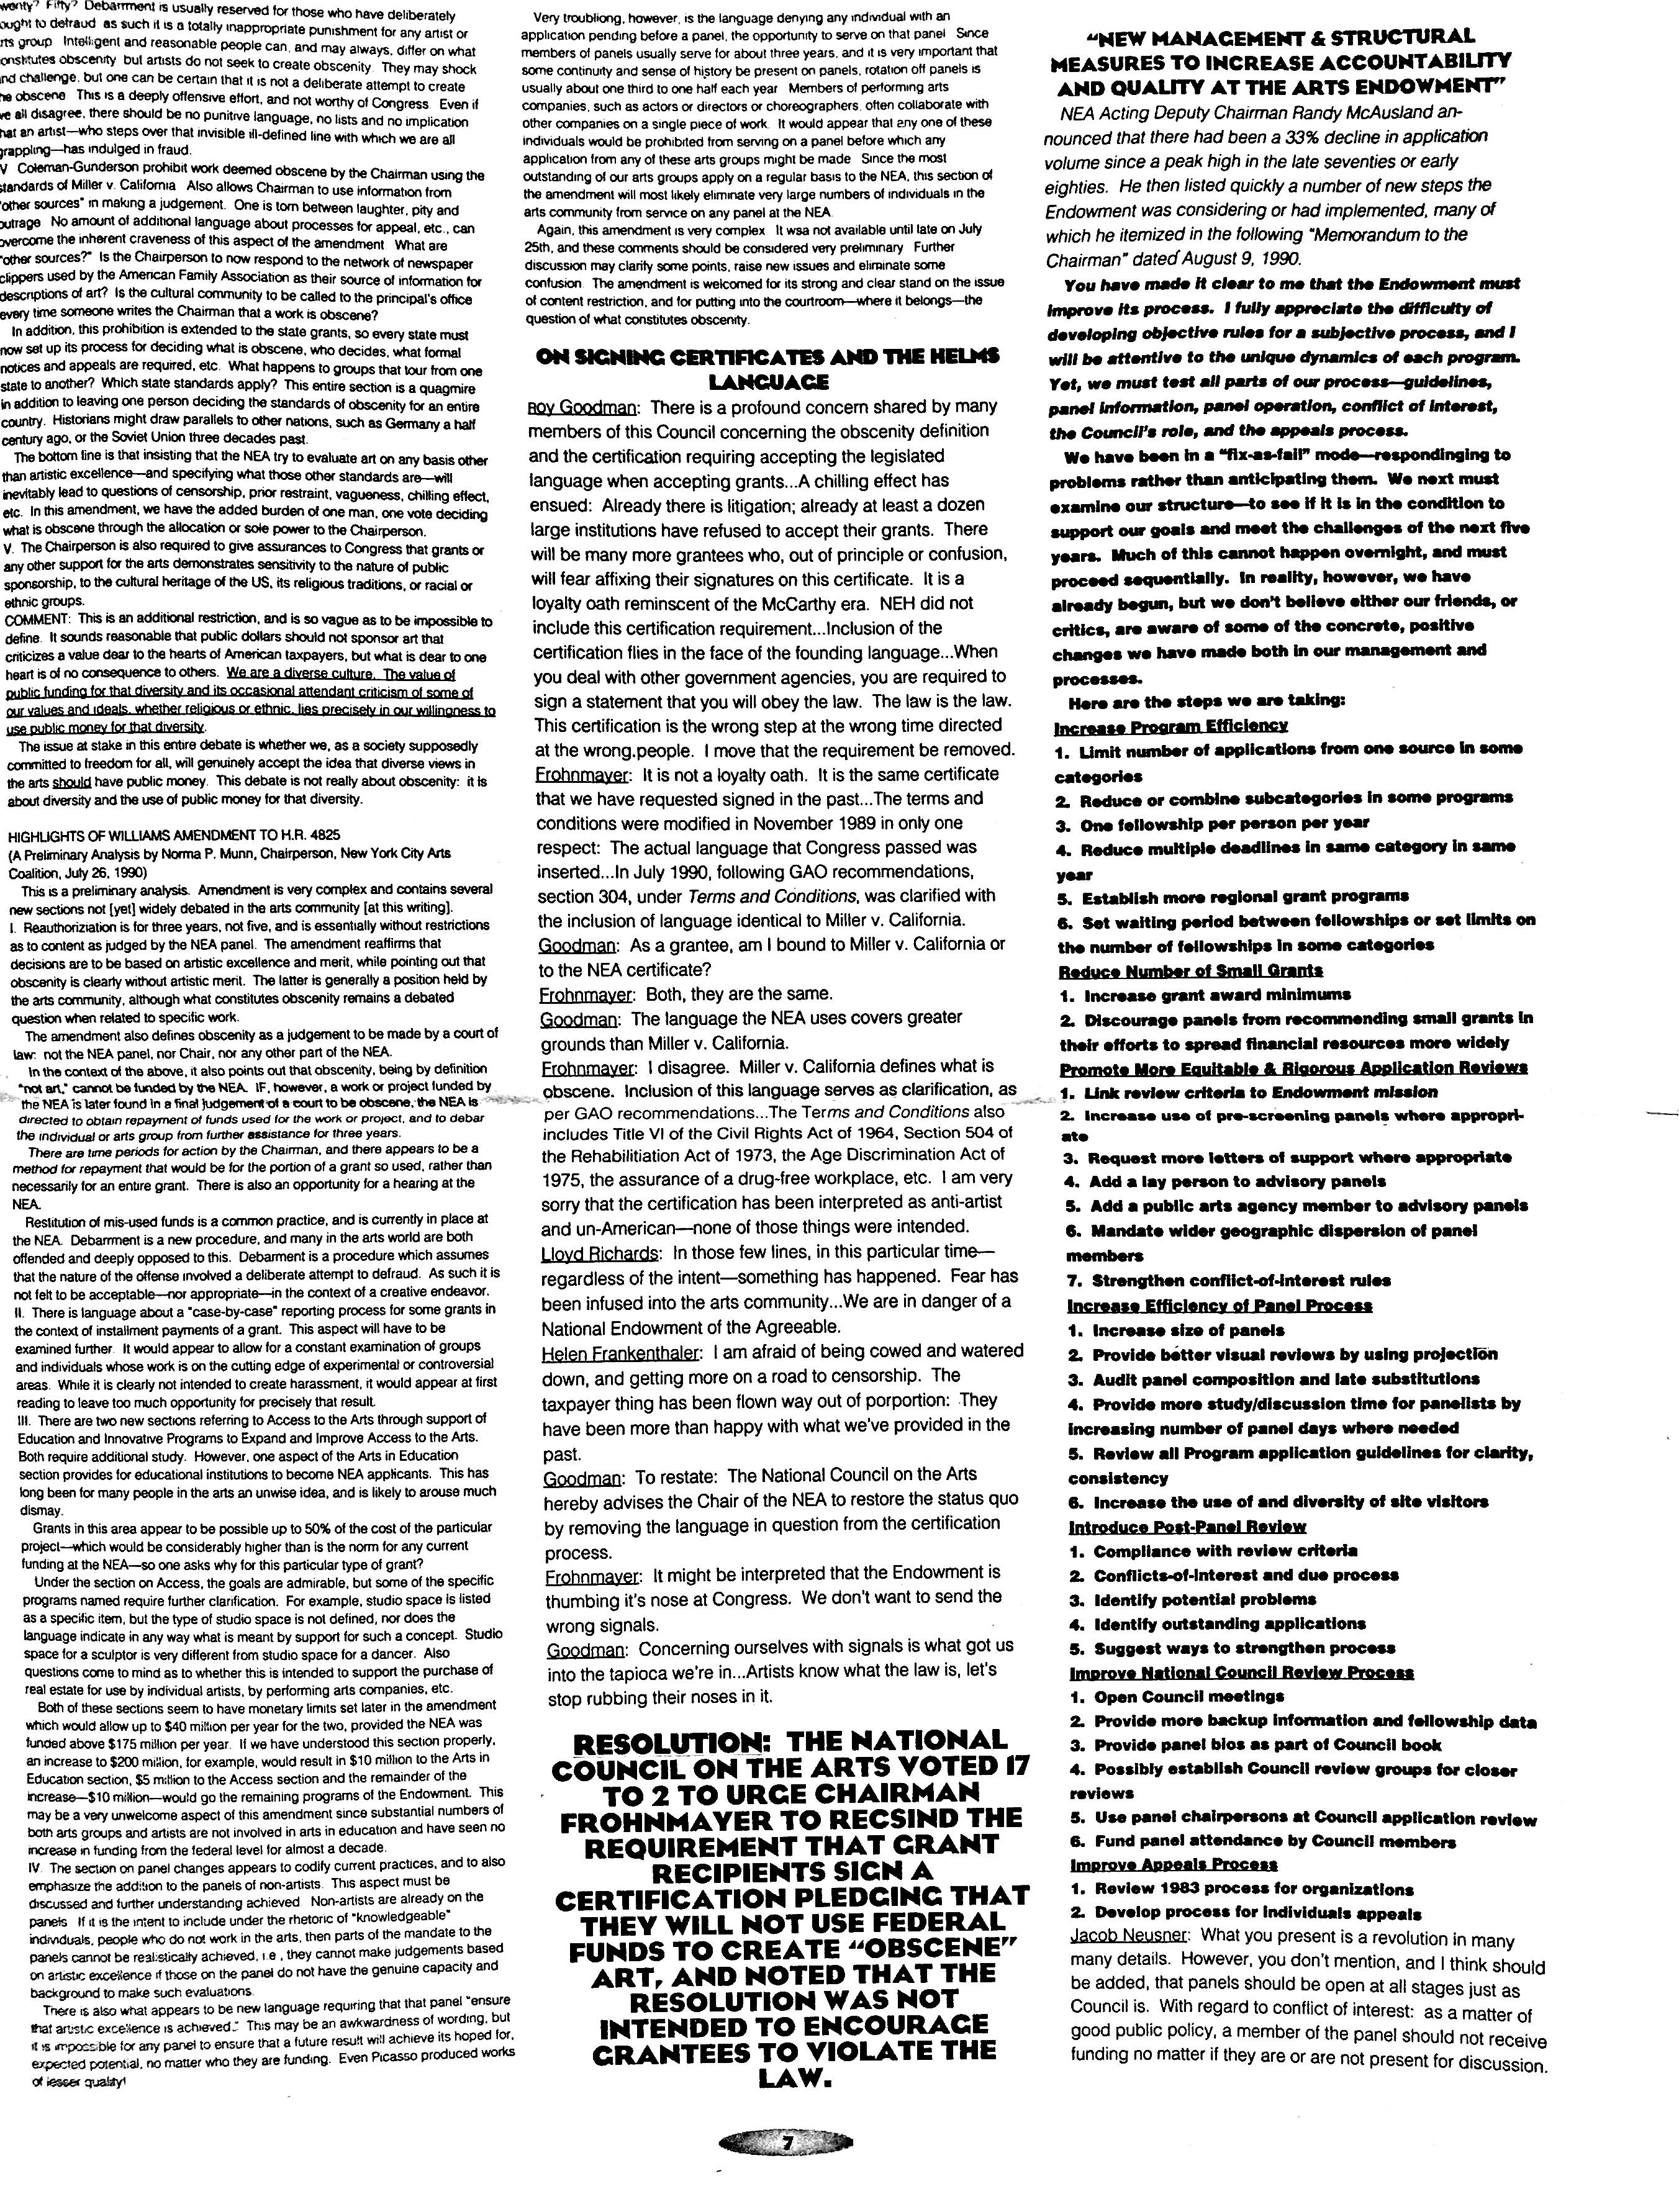 Summer 1990 - NAAO Bulletin Page 7.jpg